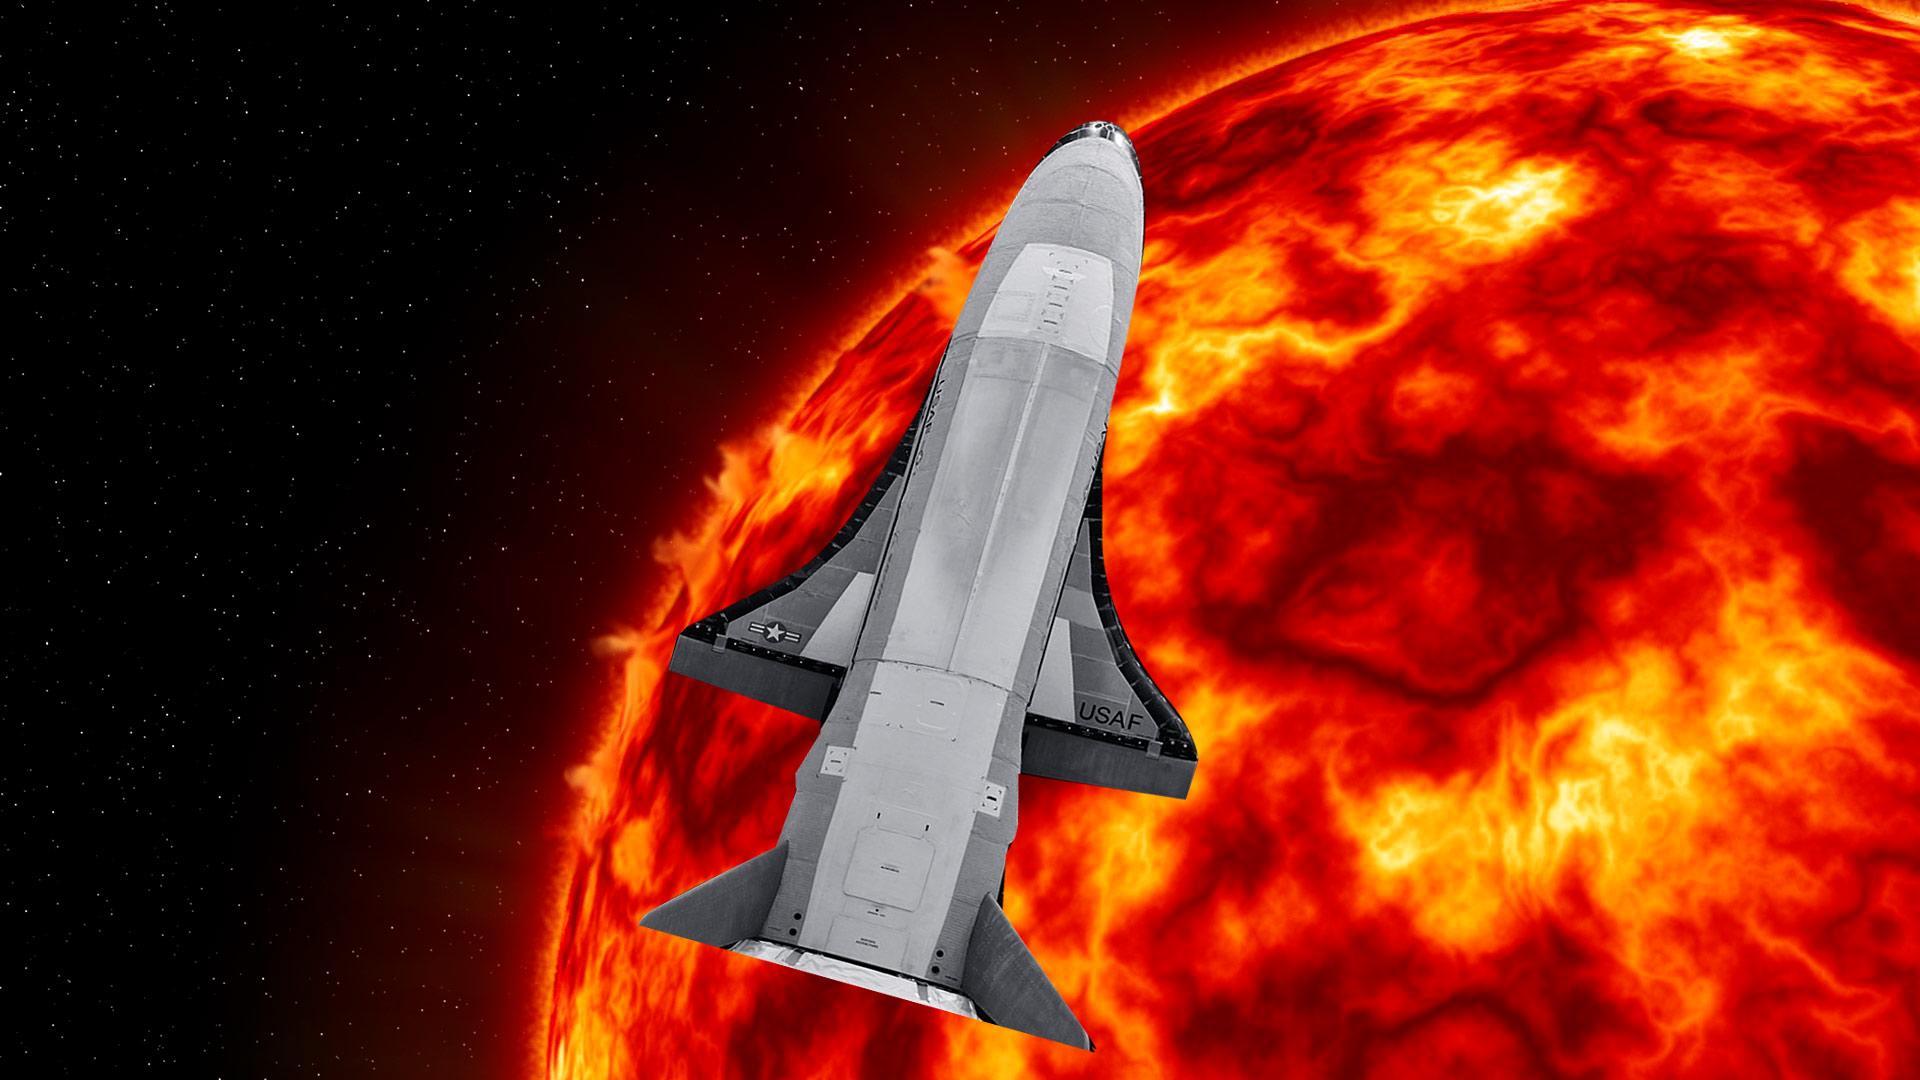 "<p>Коллаж © LIFE. Фото © <a href=""https://en.wikipedia.org/wiki/Boeing_X-37#/media/File:X-37B_2020_1.jpg"" target=""_blank"" rel=""noopener noreferrer"">Wikipedia</a> </p>"